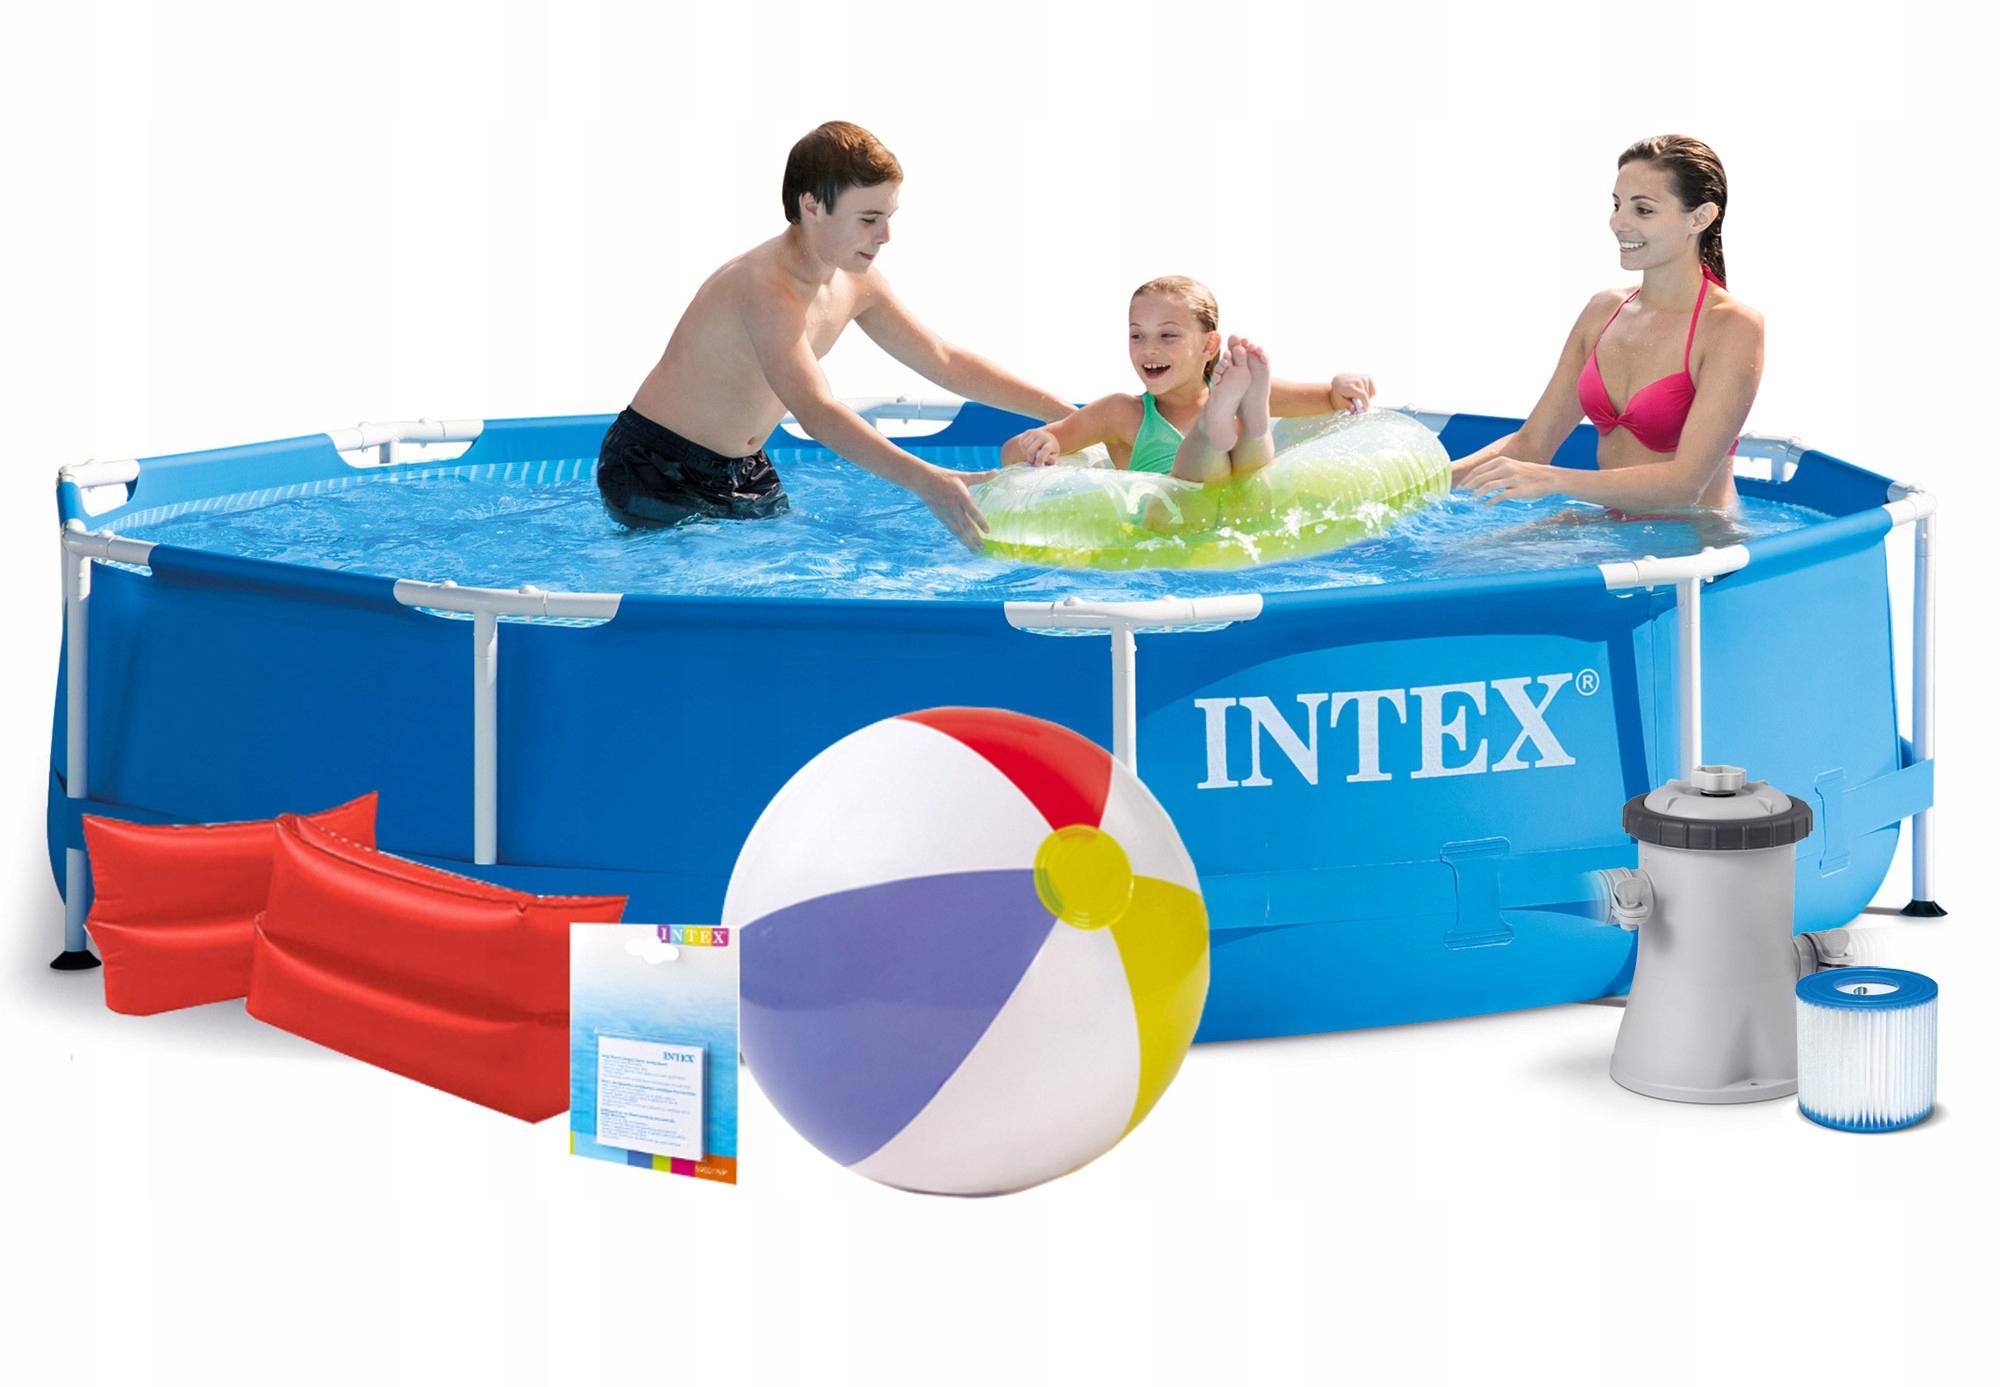 INTEX 28202 9w1 BASEN STELAŻOWY 305x76cm POMPA